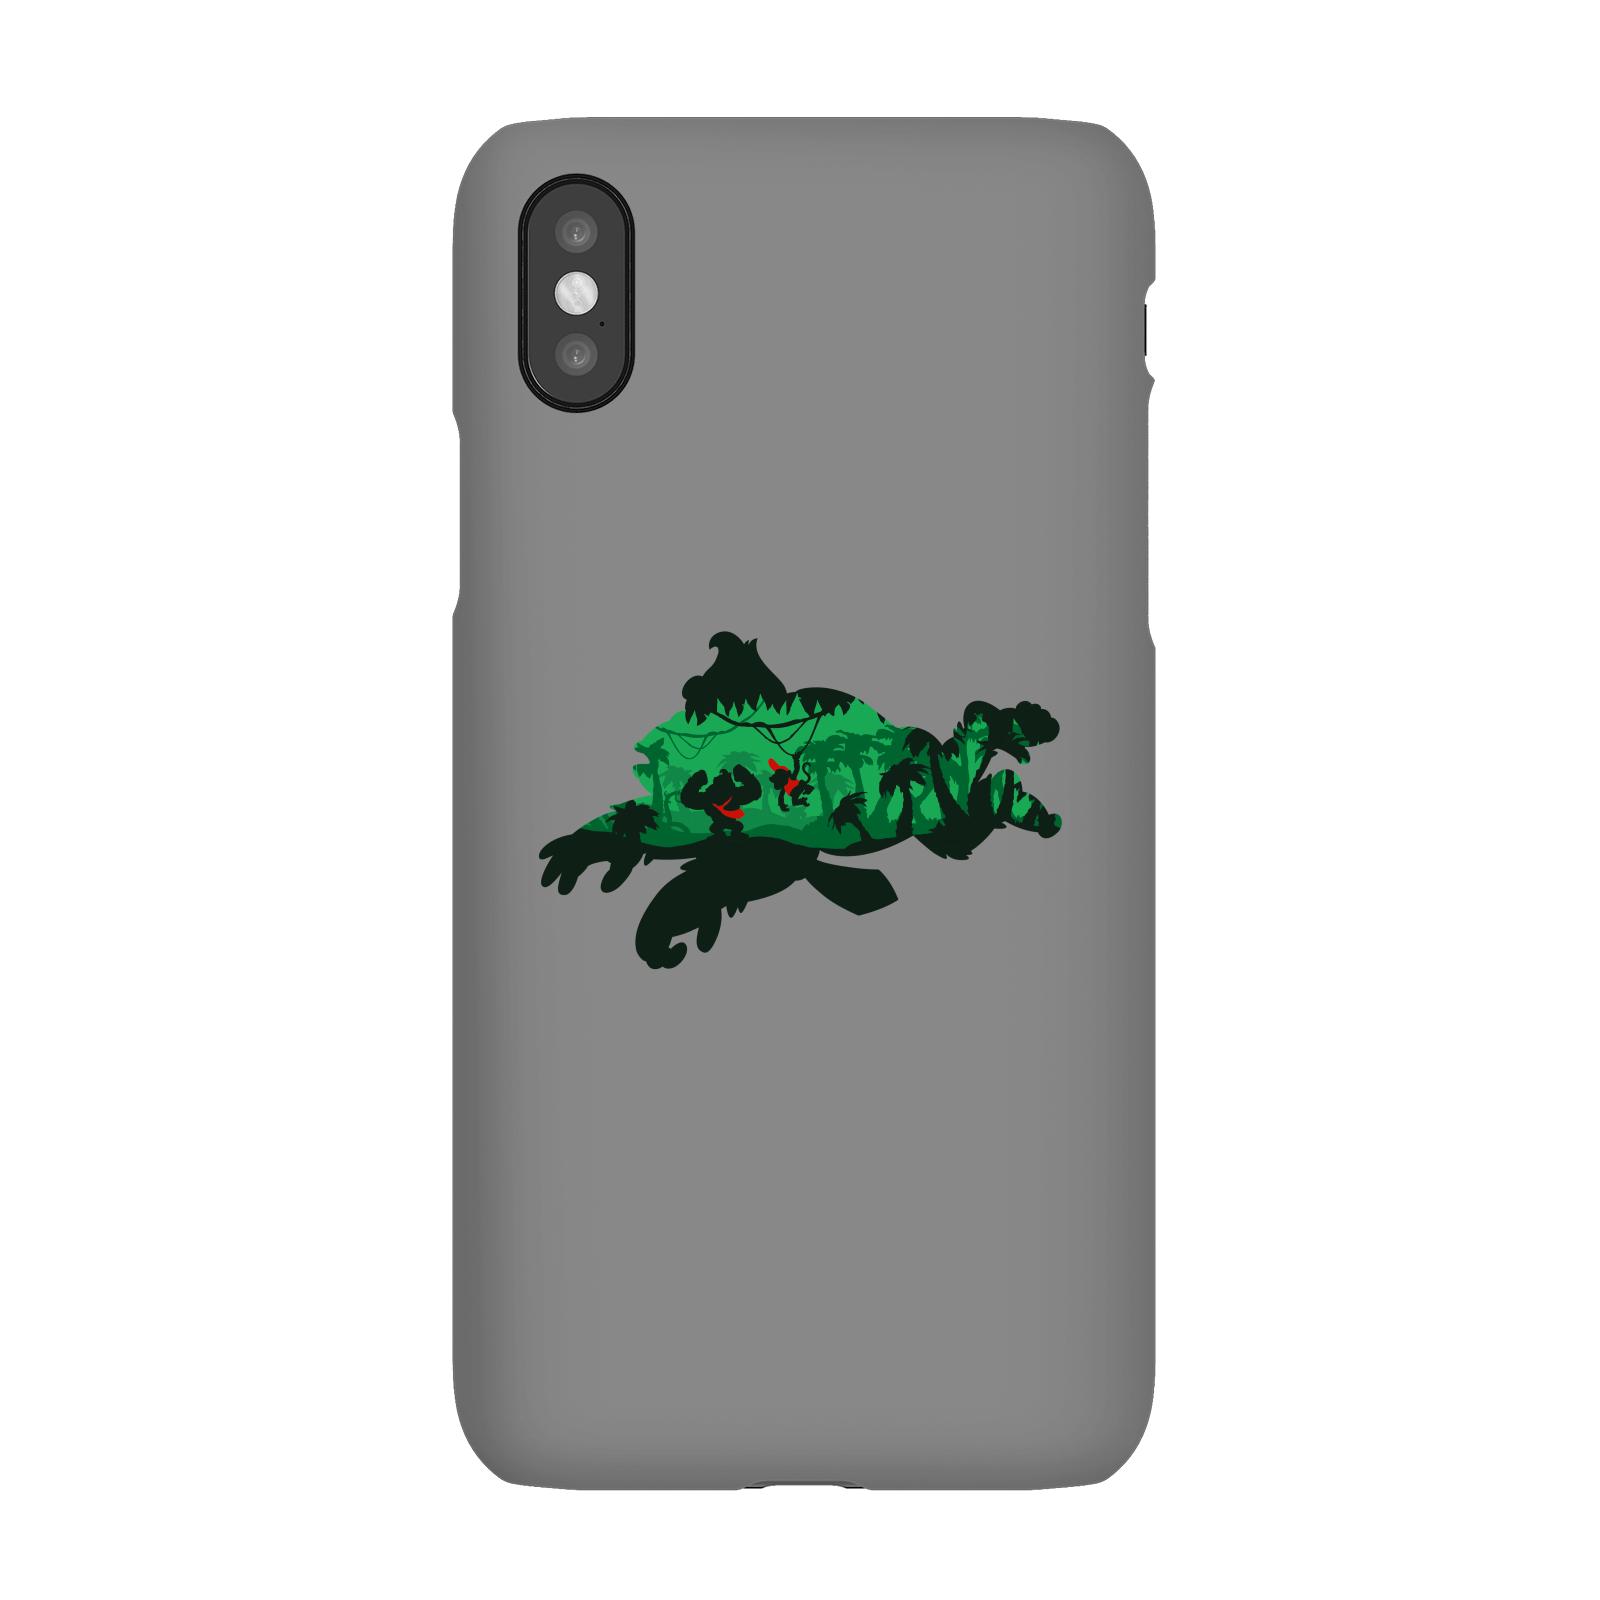 Nintendo Donkey Kong Silhouette Smartphone Hülle - Samsung S10E - Snap Hülle Matt